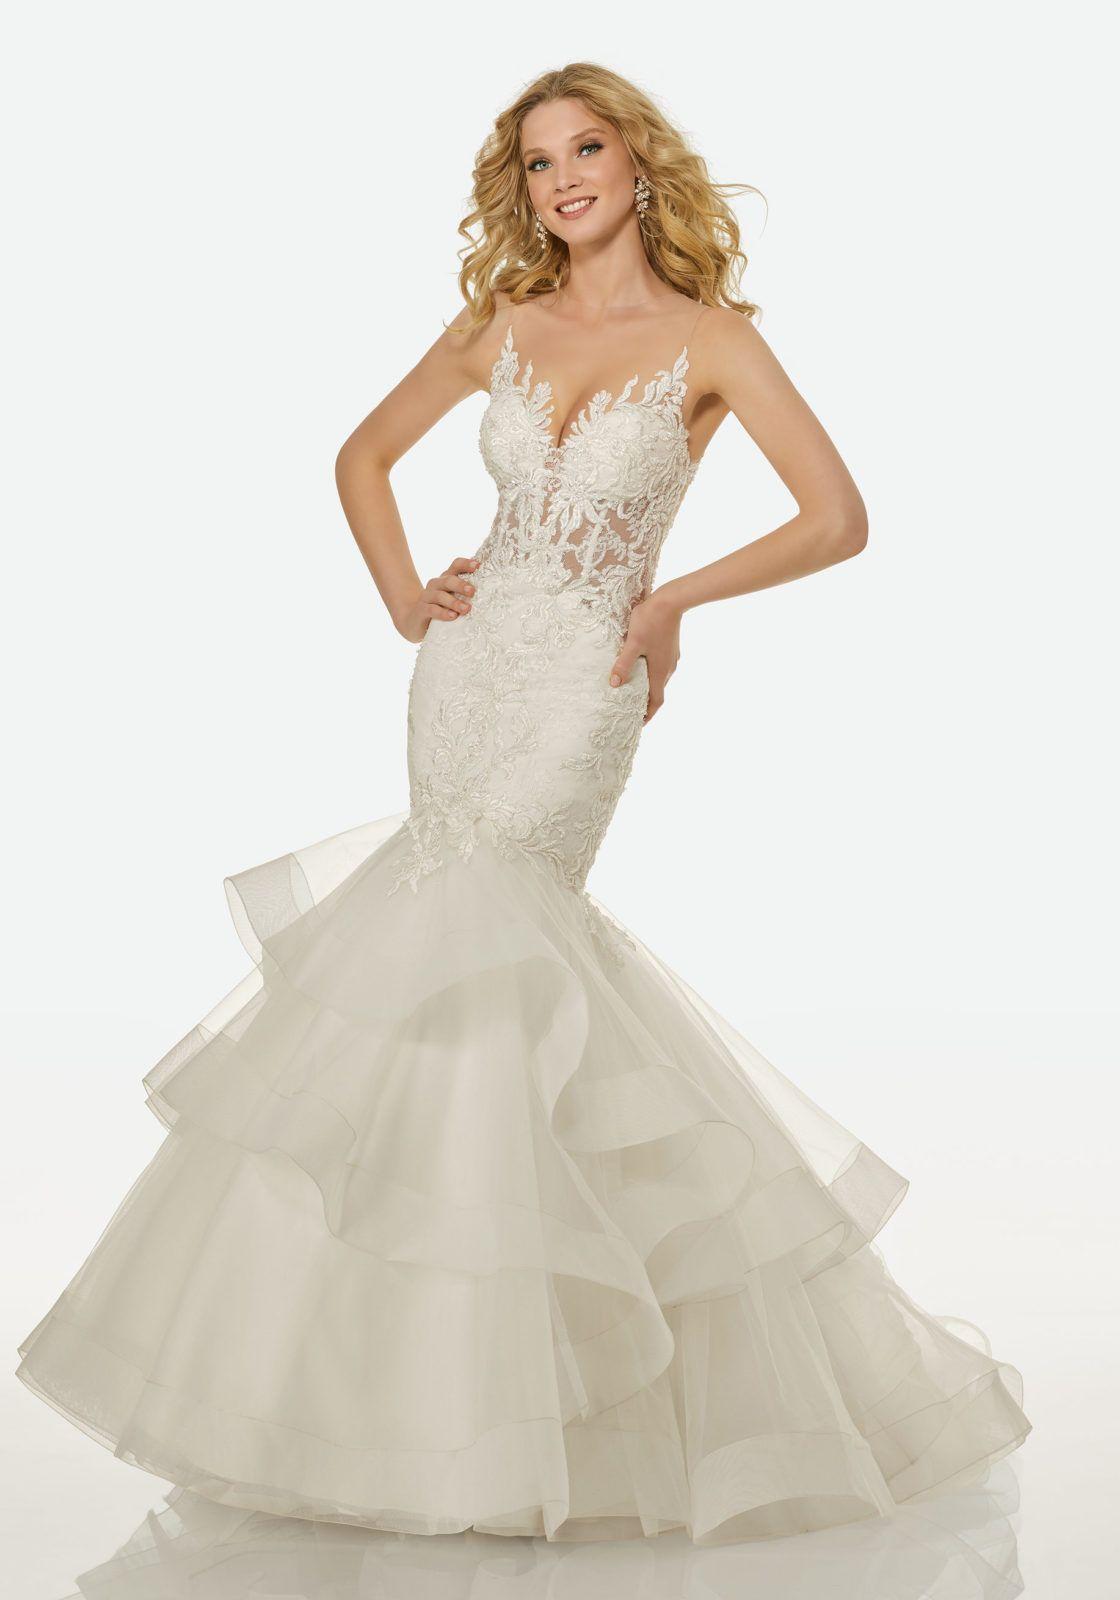 Randy fenoli wedding dresses  Collins Wedding Dress  Vestidos  Pinterest  Wedding dress